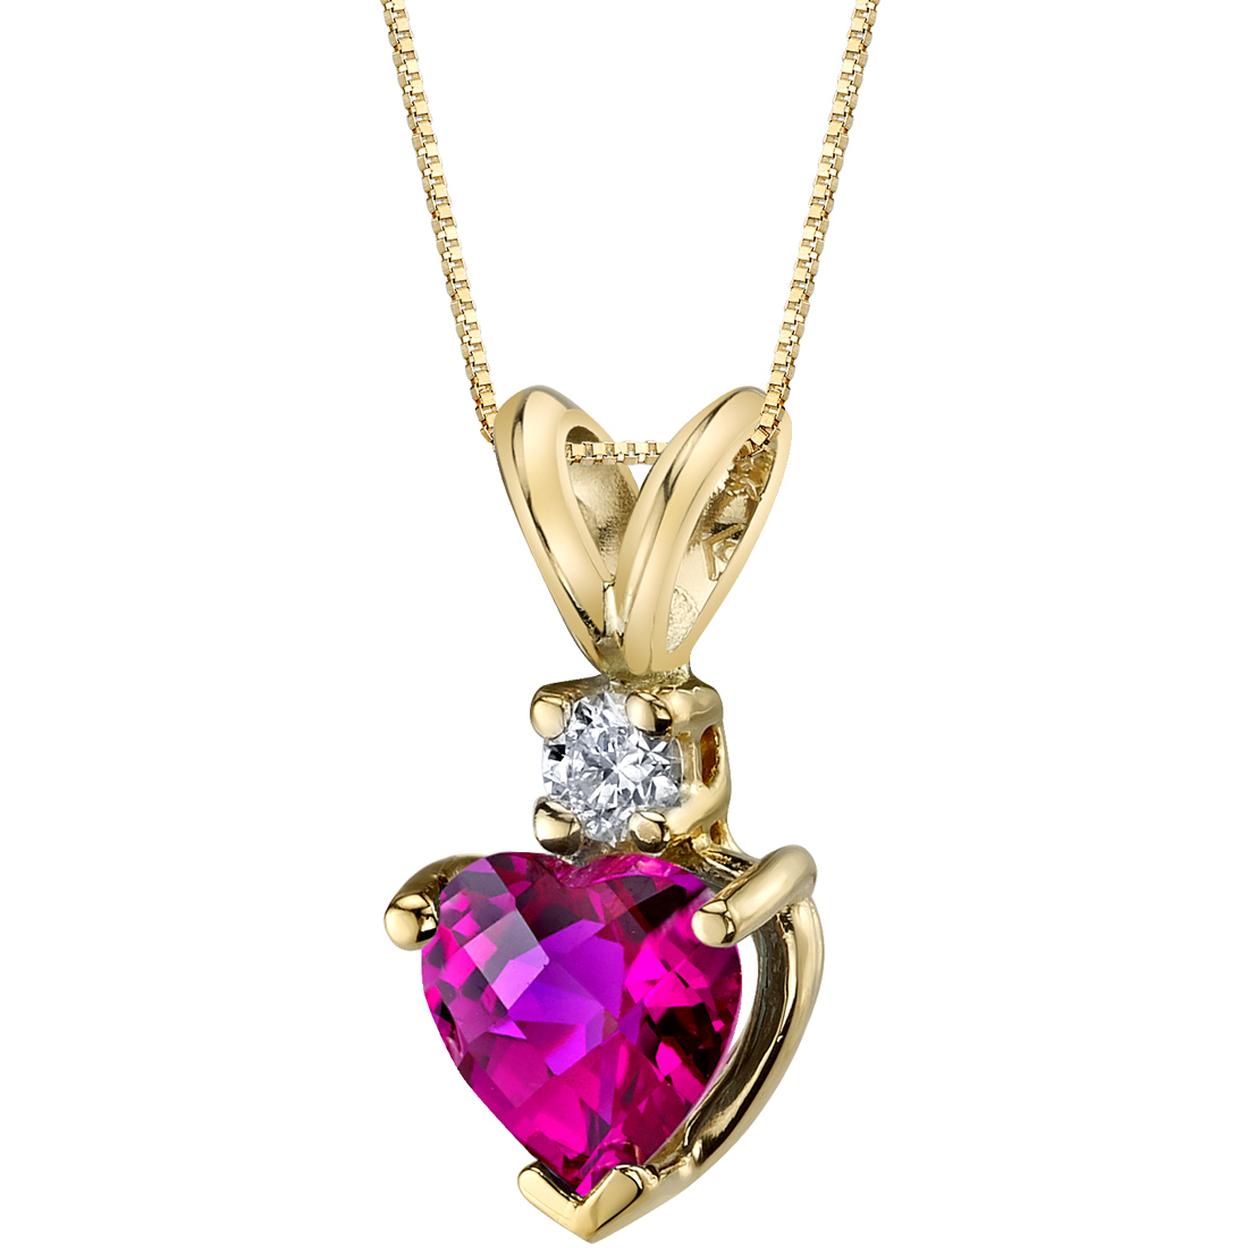 Oravo 14 Karat Yellow Gold Heart Shape 1.00 Carats Created Ruby Diamond Pendant